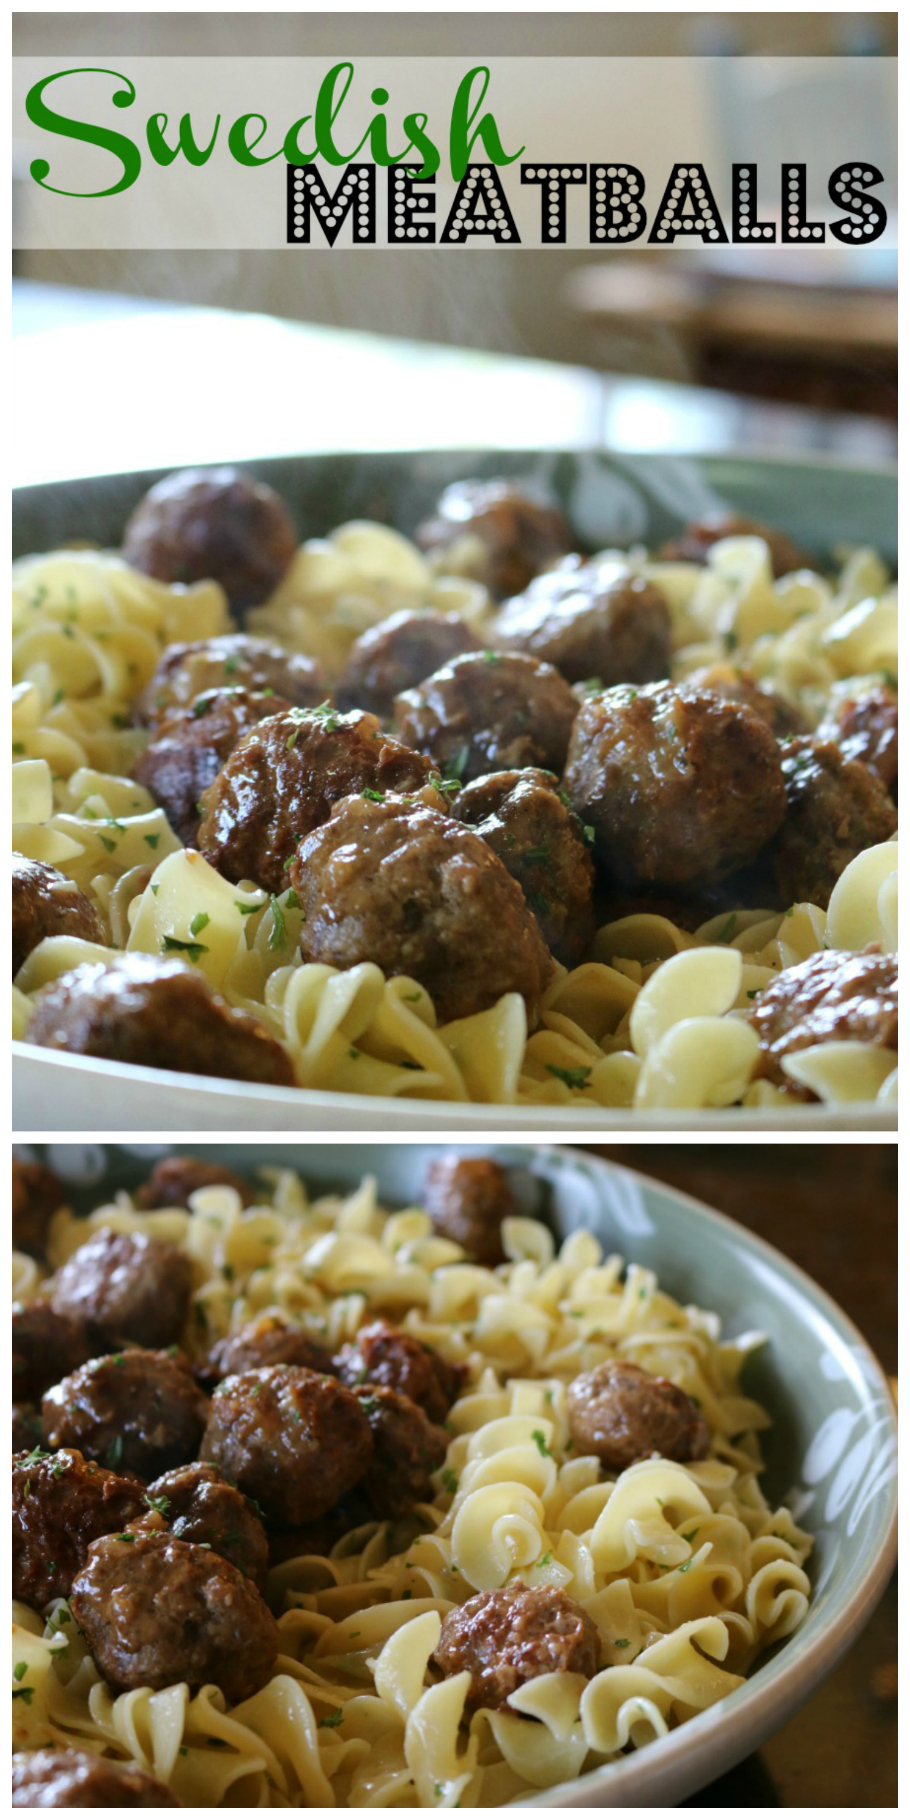 Sweedish Meatballs over Egg Noodles  CeceliasGoodStuff.com   Good Food for Good People